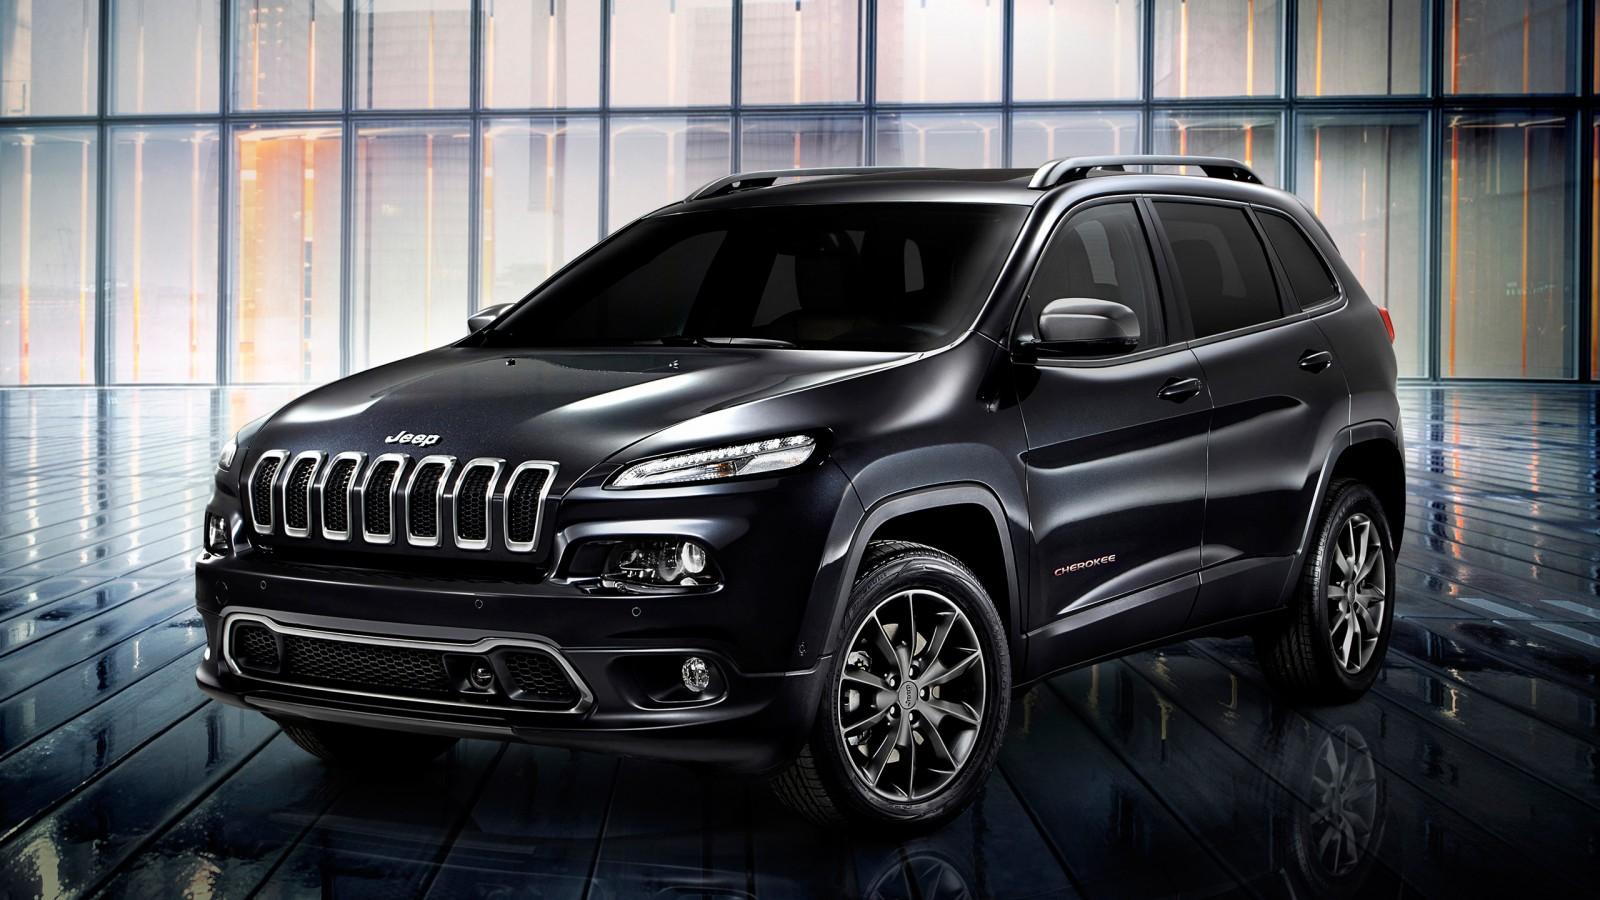 2014 Jeep Cherokee Urbane Concept Wallpaper | HD Car ...